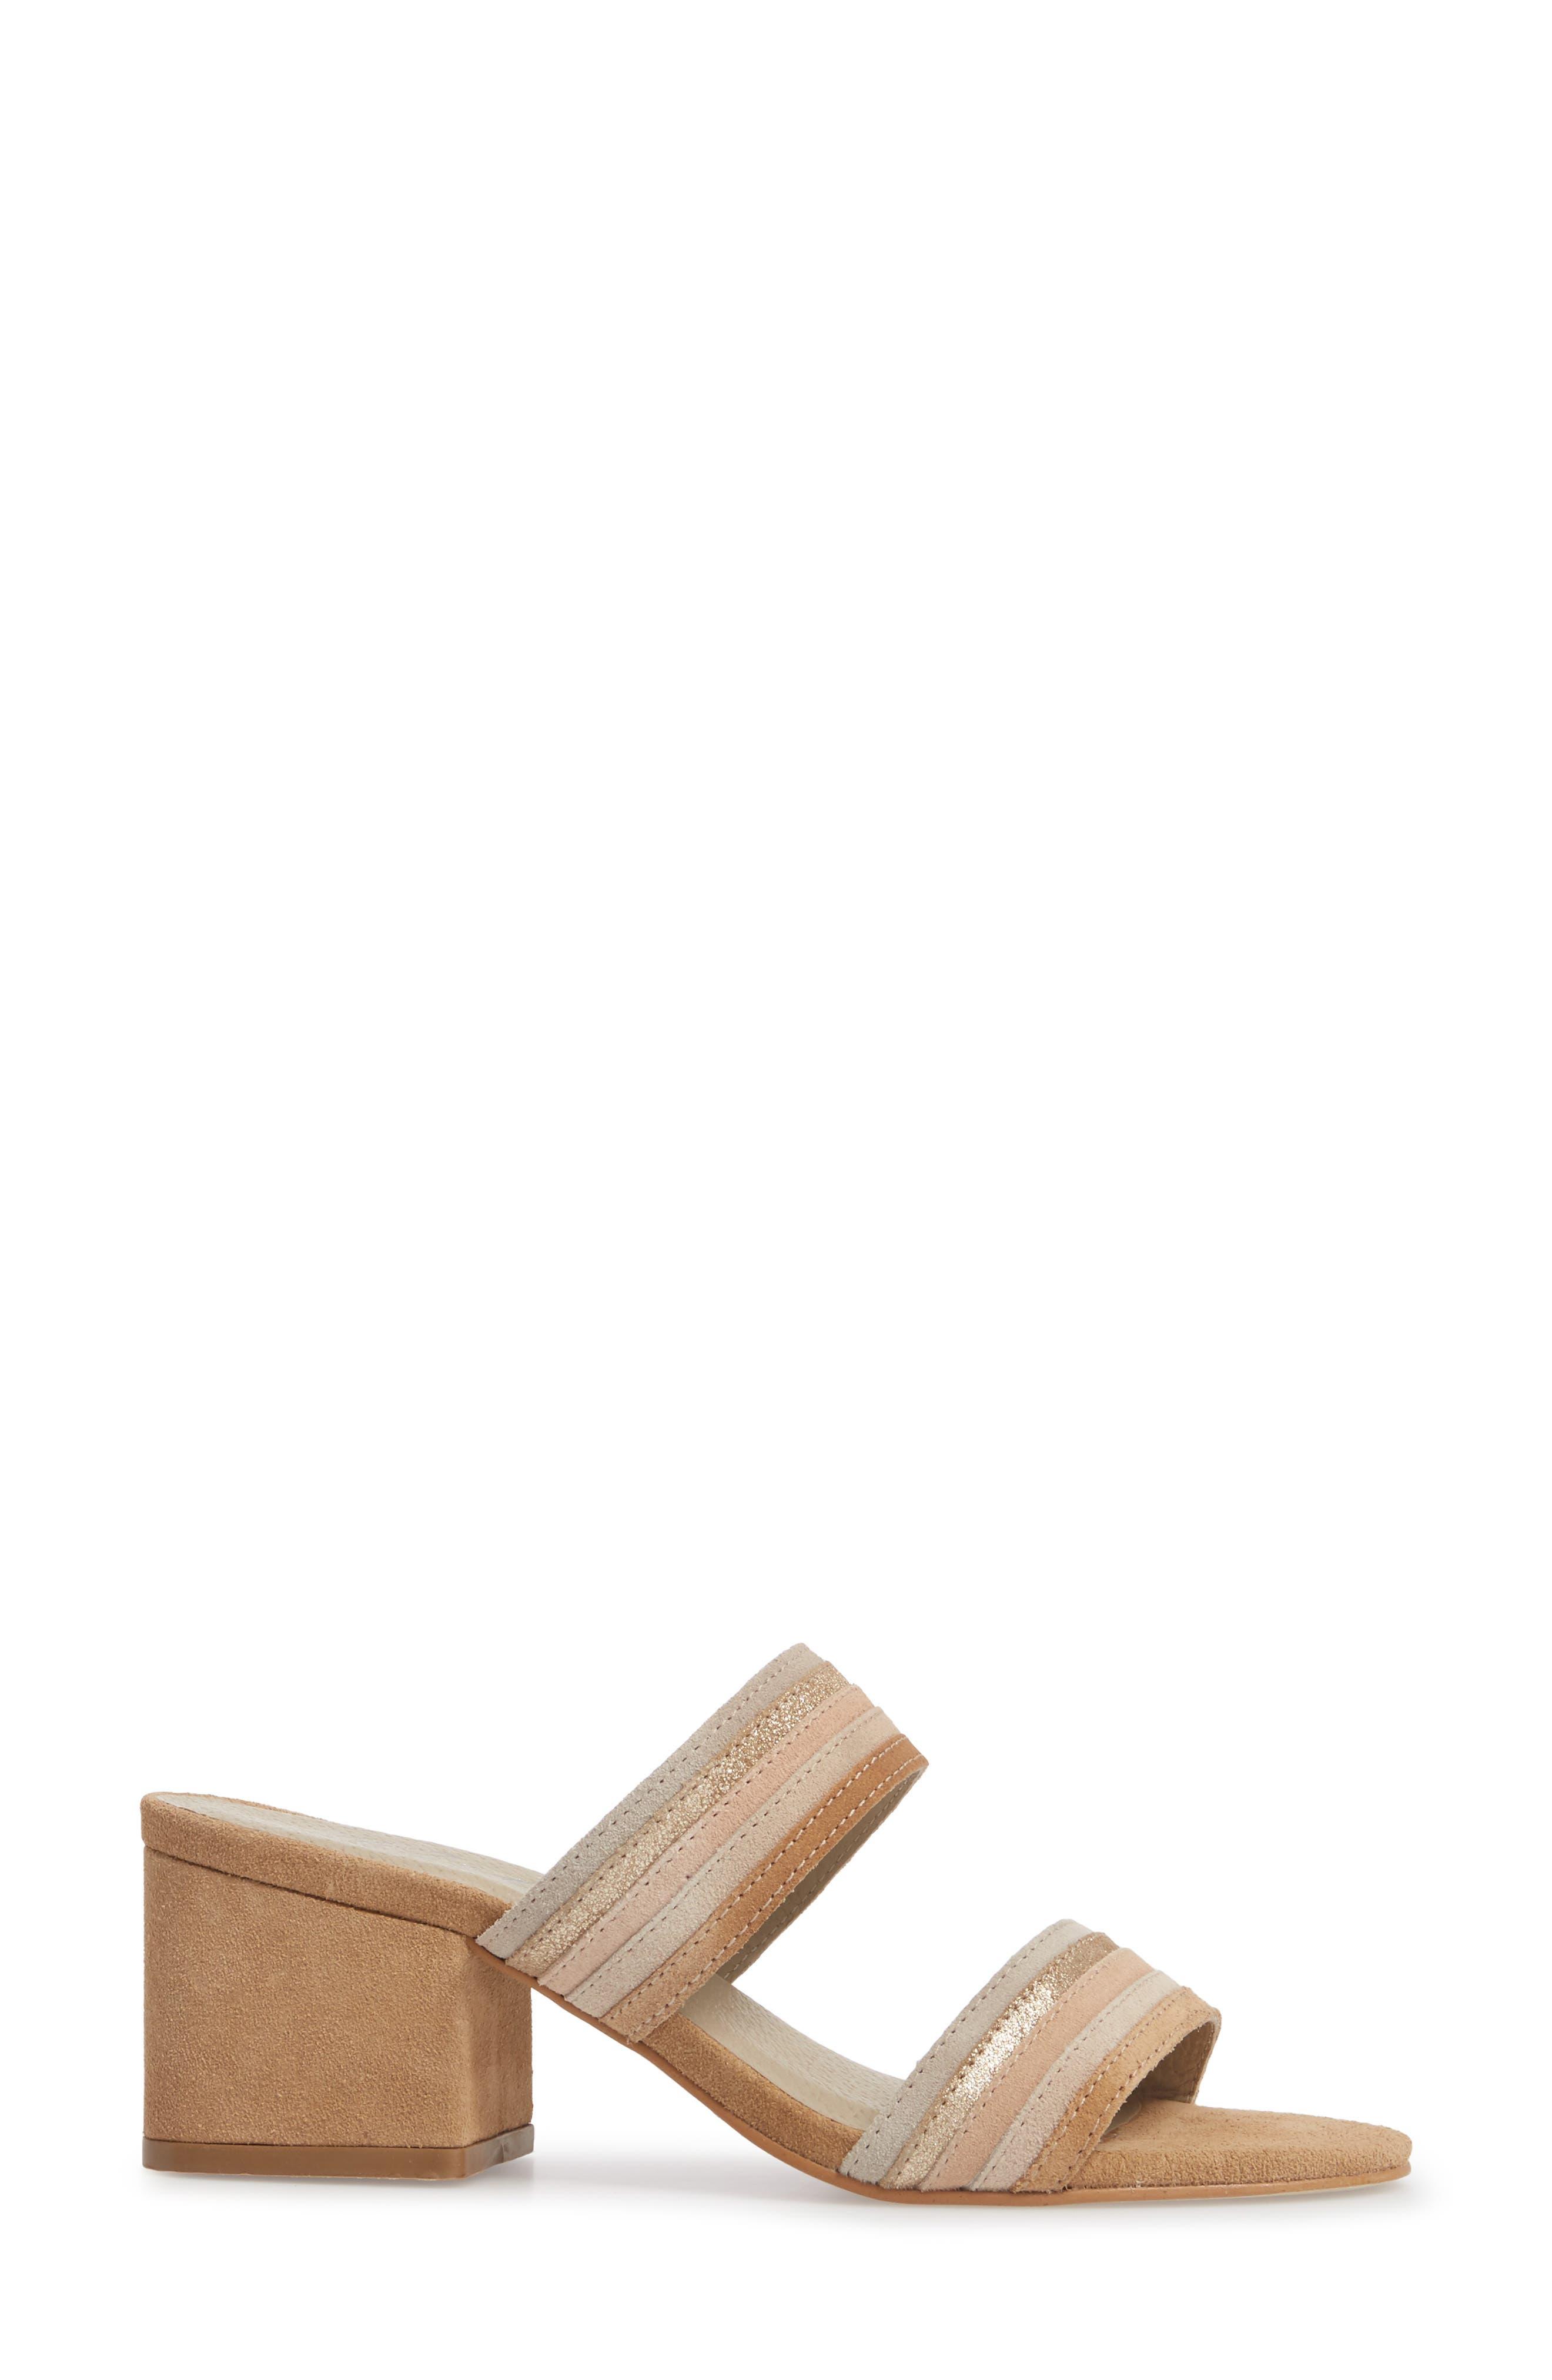 Bonita Slide Sandal,                             Alternate thumbnail 3, color,                             NATURAL SUEDE